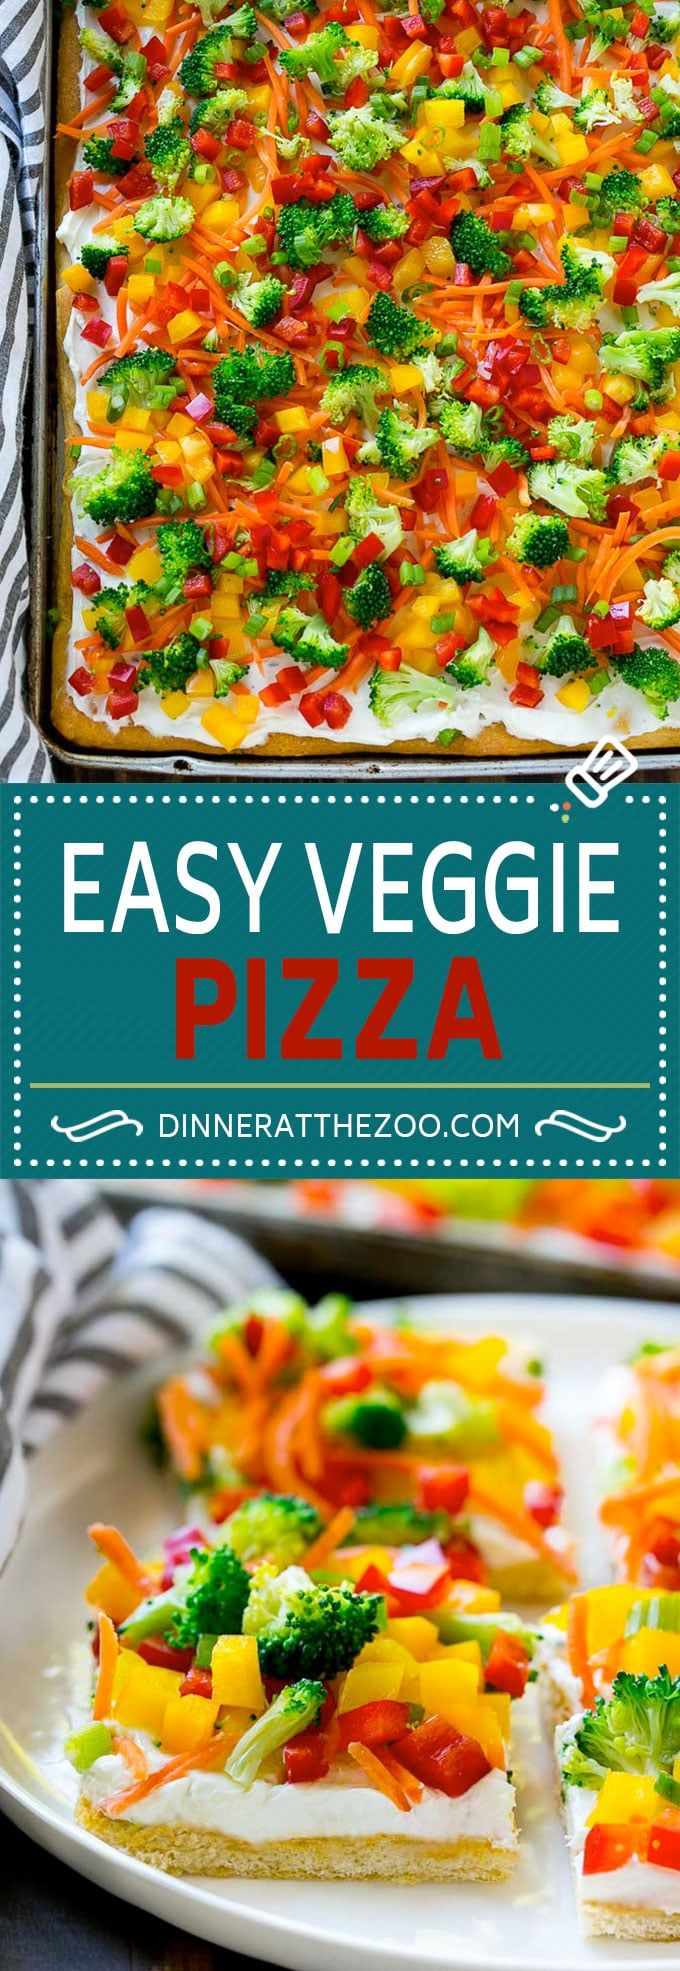 Veggie Pizza Recipe #ad #RanchOut @walmart @glad @hiddenvalley